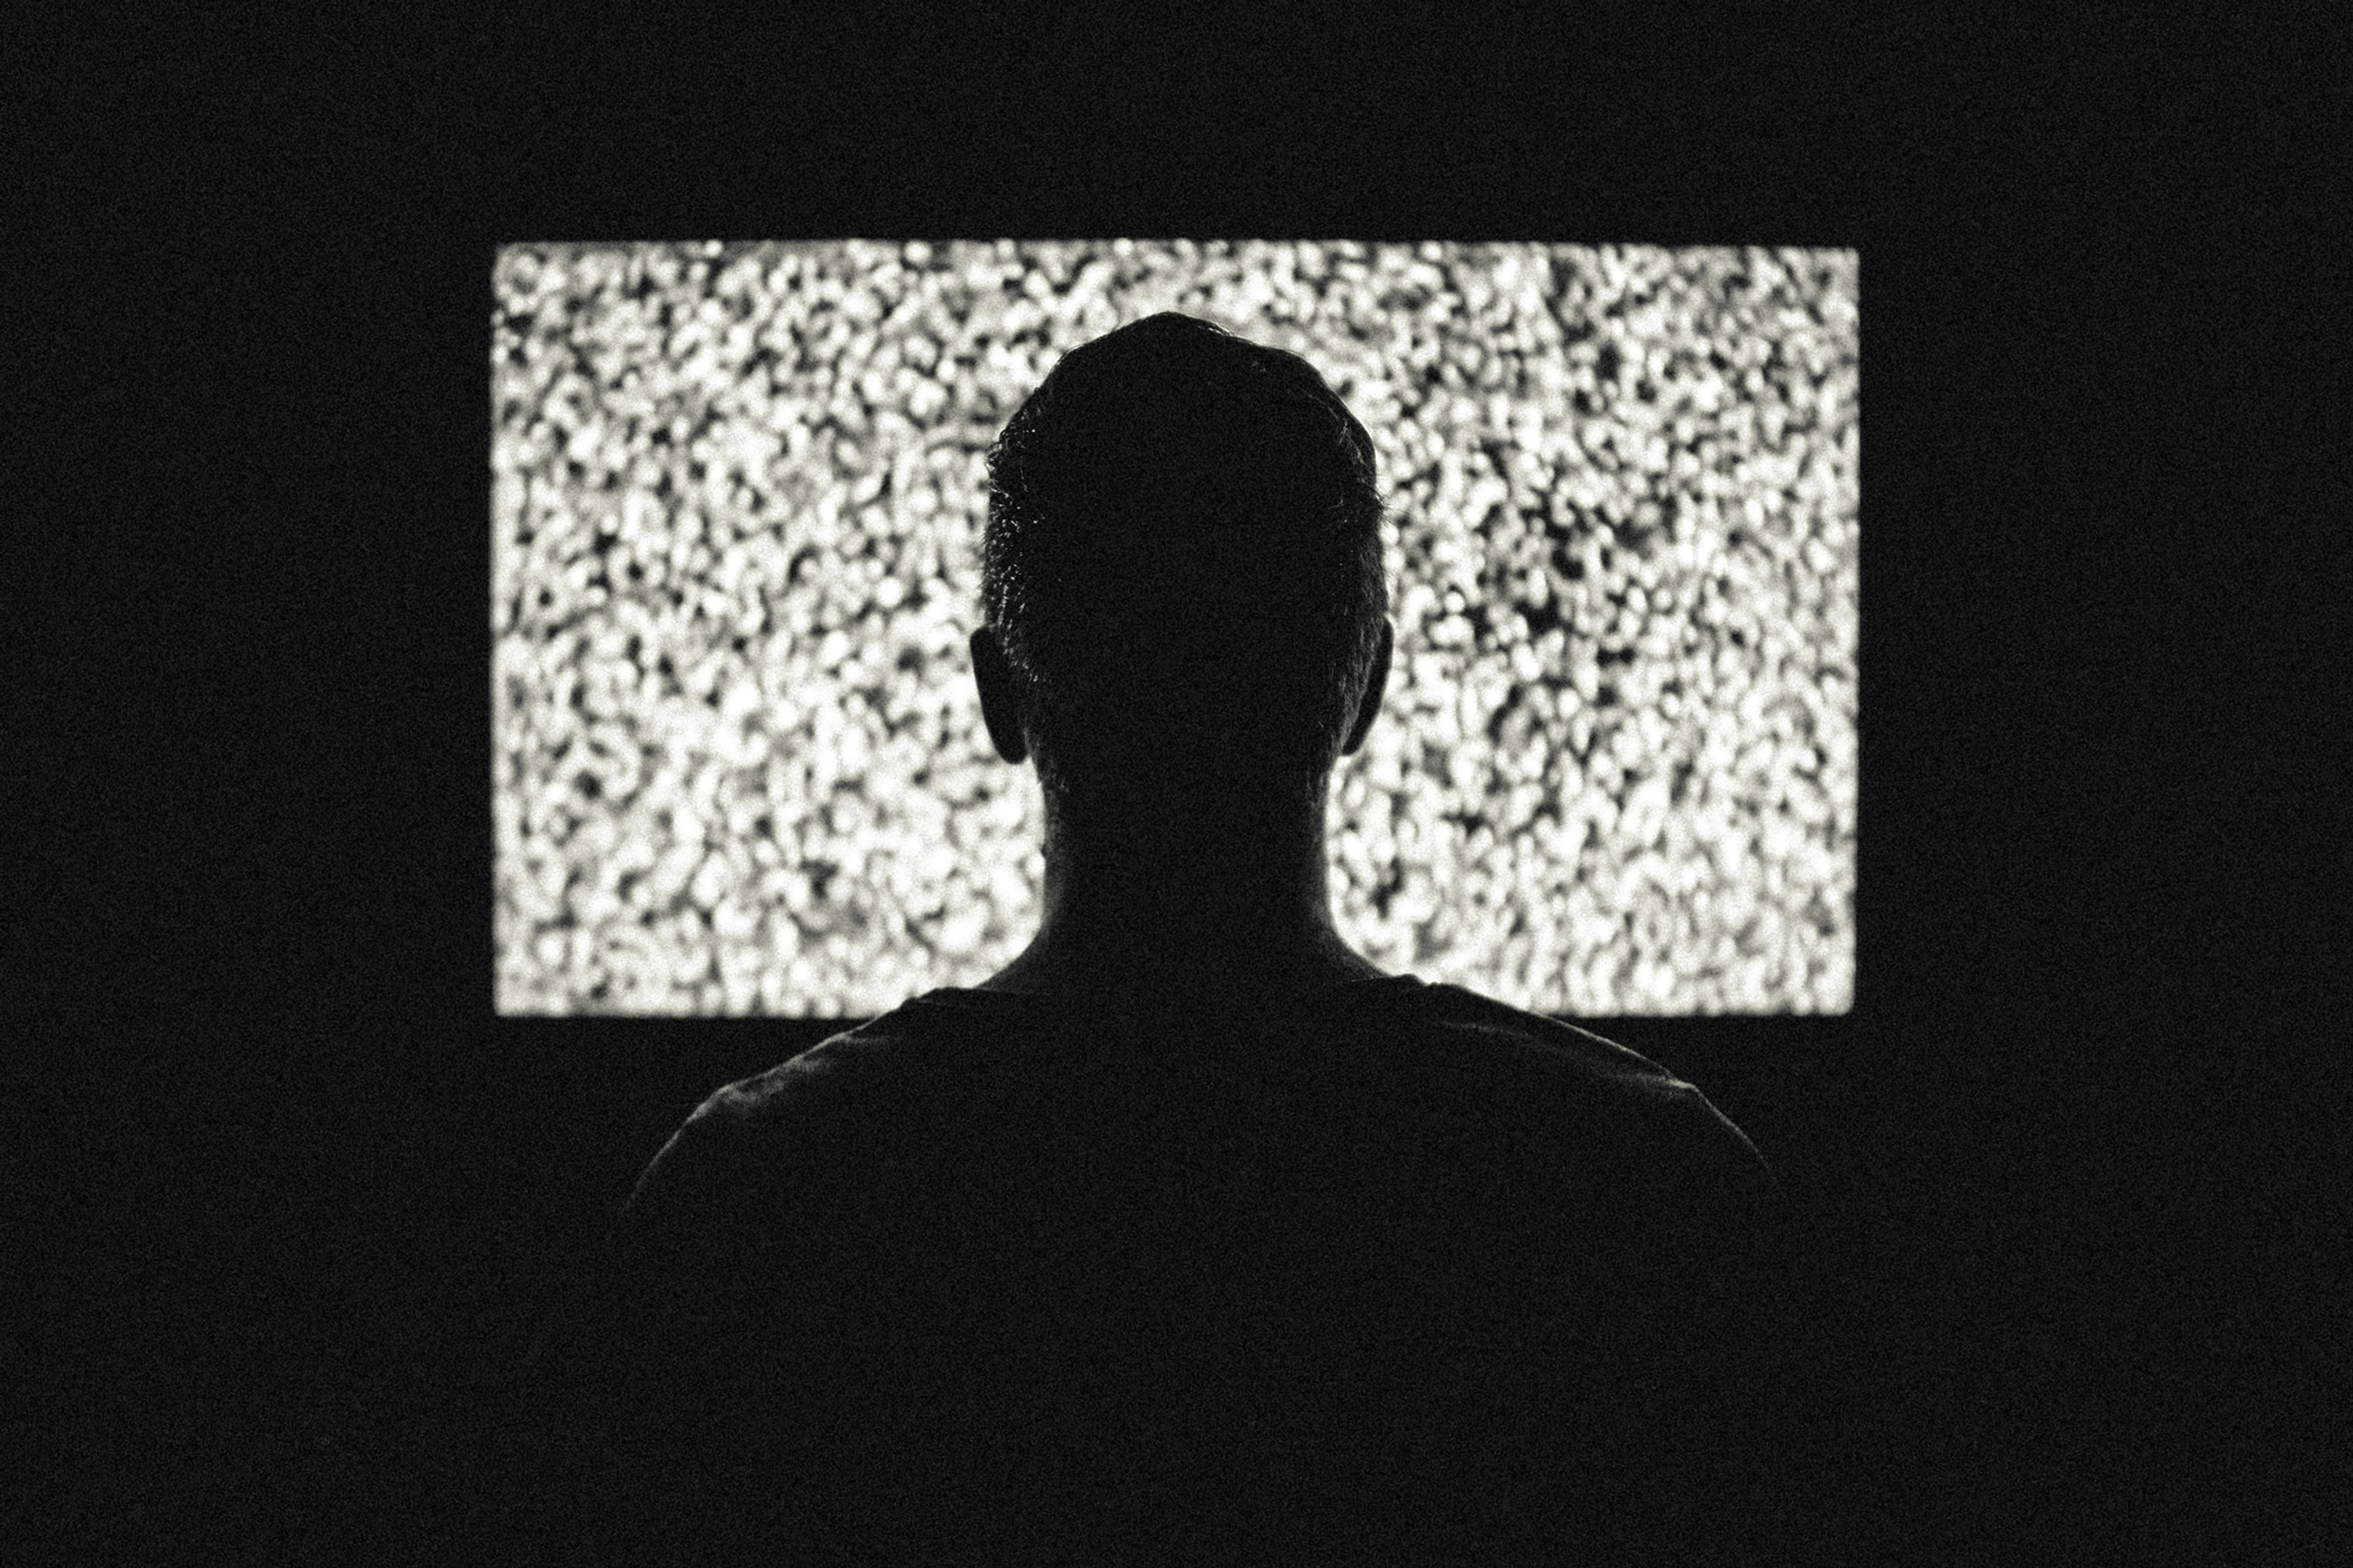 GET MEDIA LIT! What Is Media Literacy?